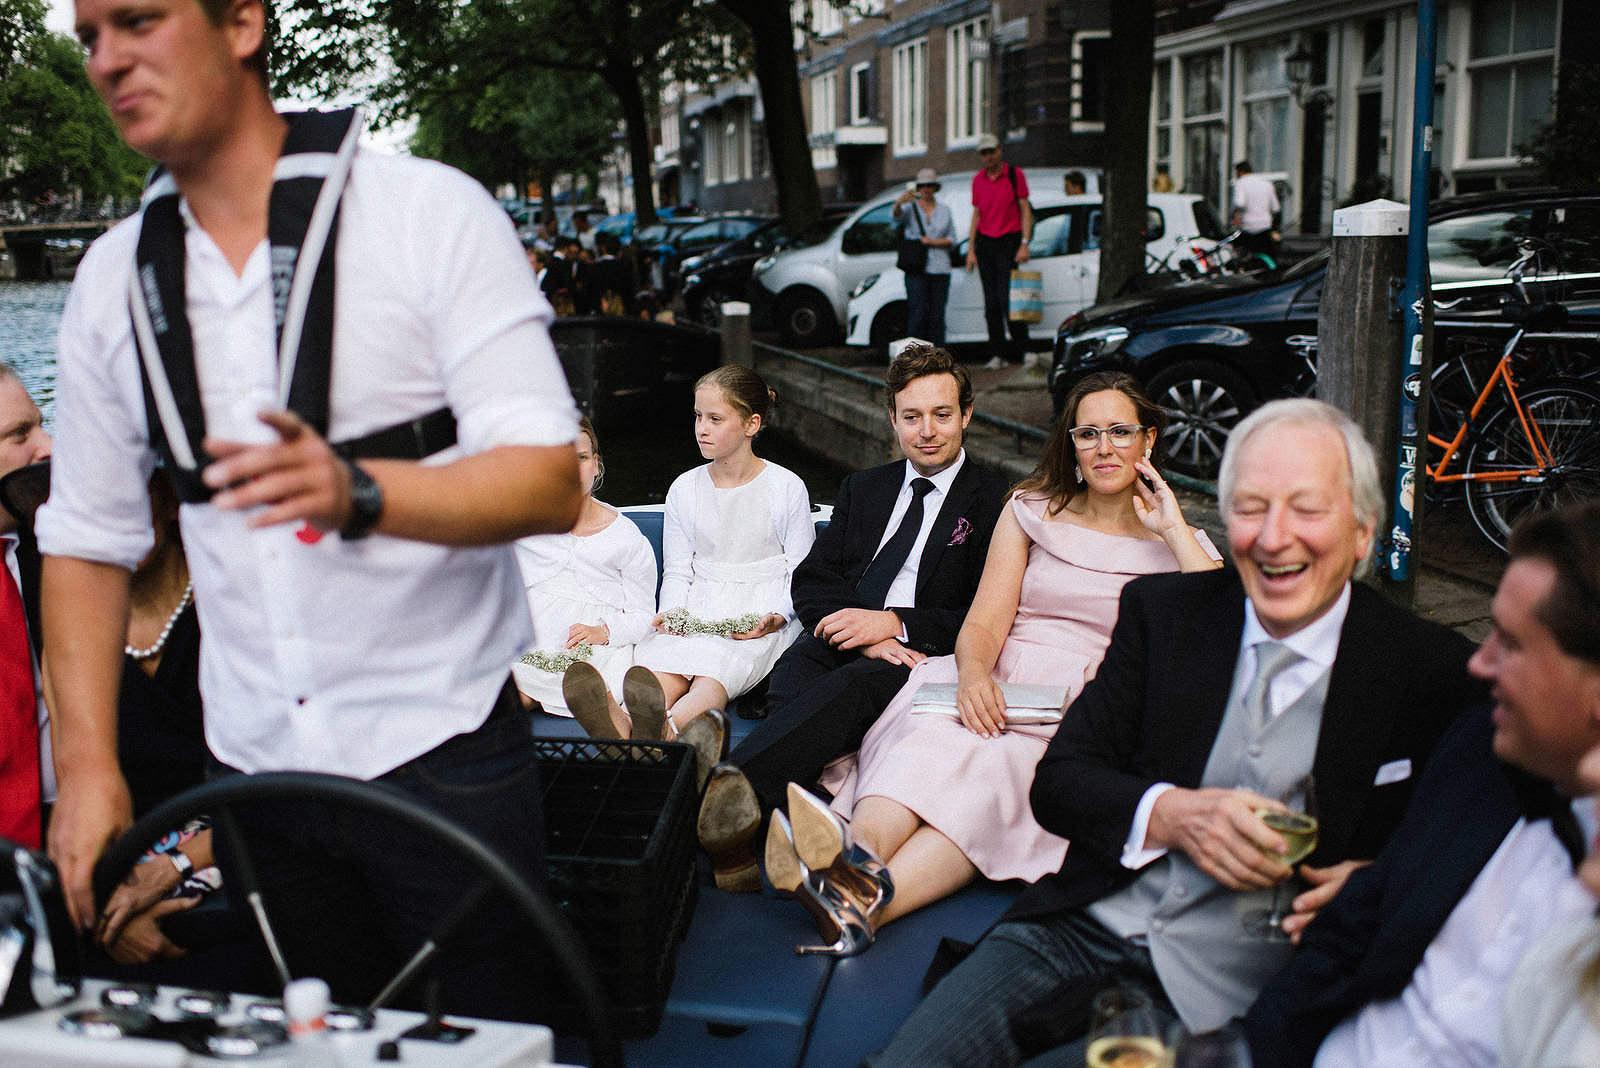 Fotograf Konstanz - Destination Wedding Photographer Amsterdam 050 - Destination Wedding Amsterdam  - 159 -